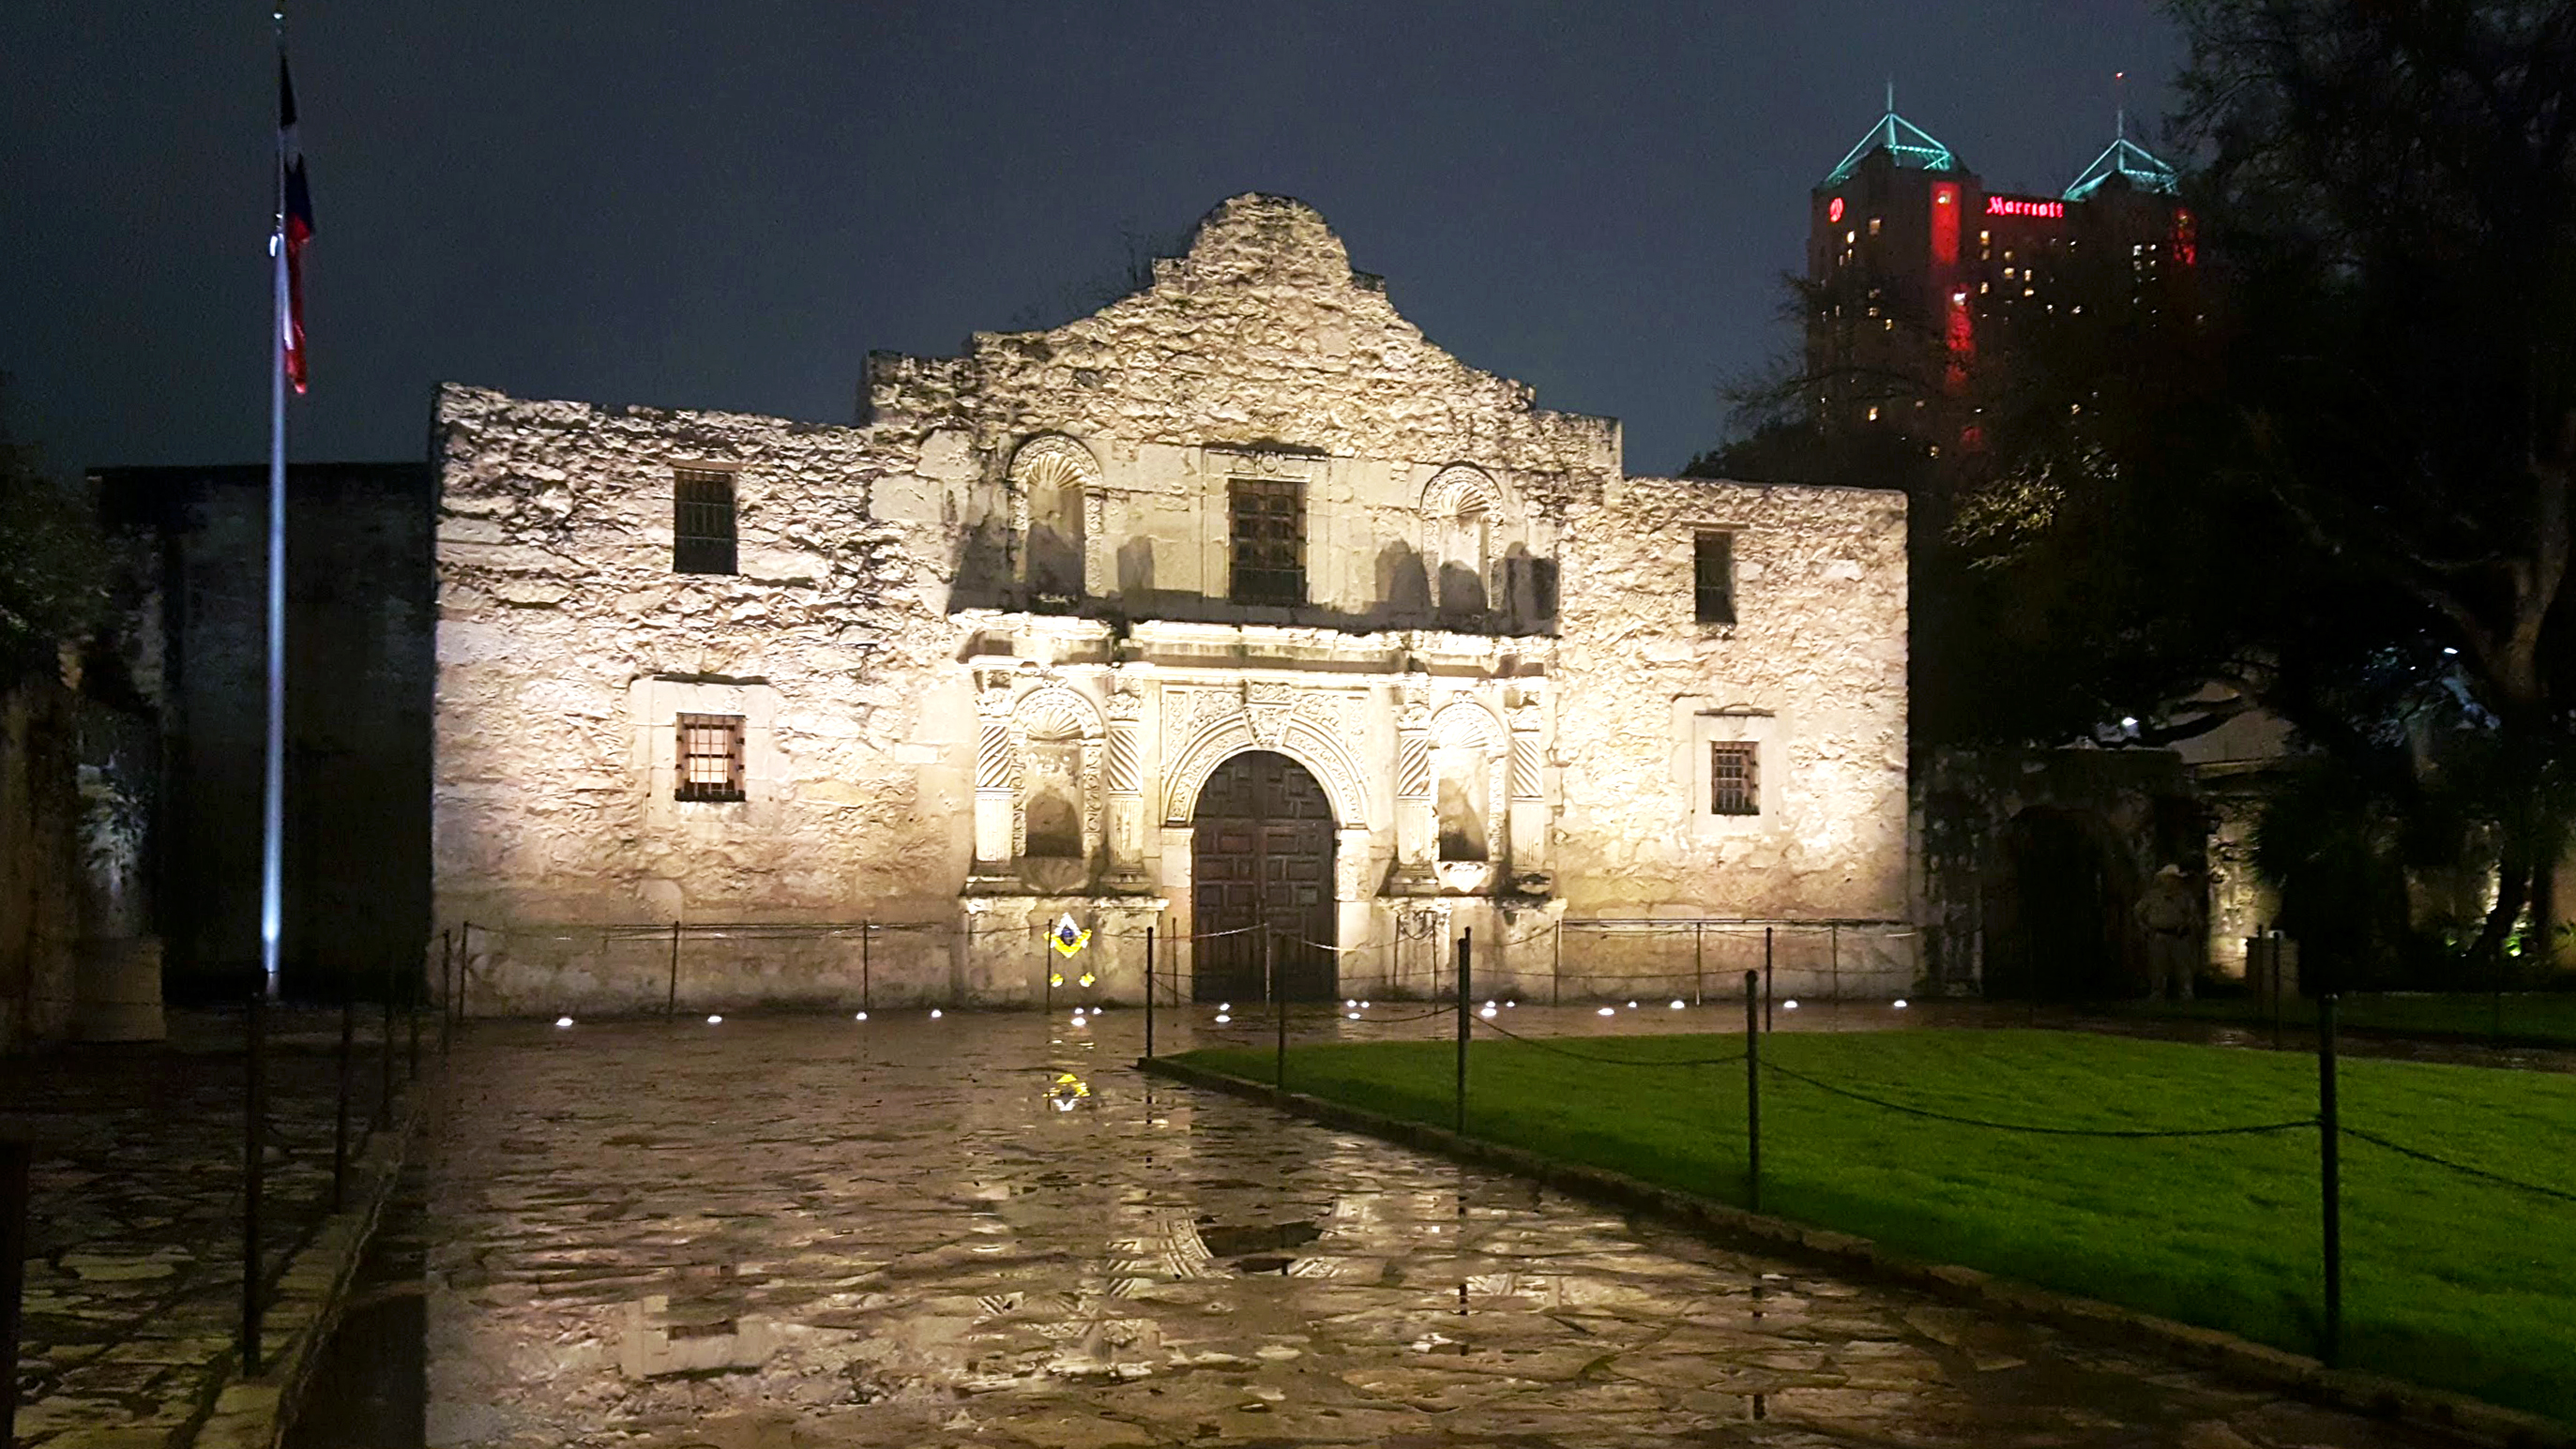 Remember The Alamo in San Antonio Texas.